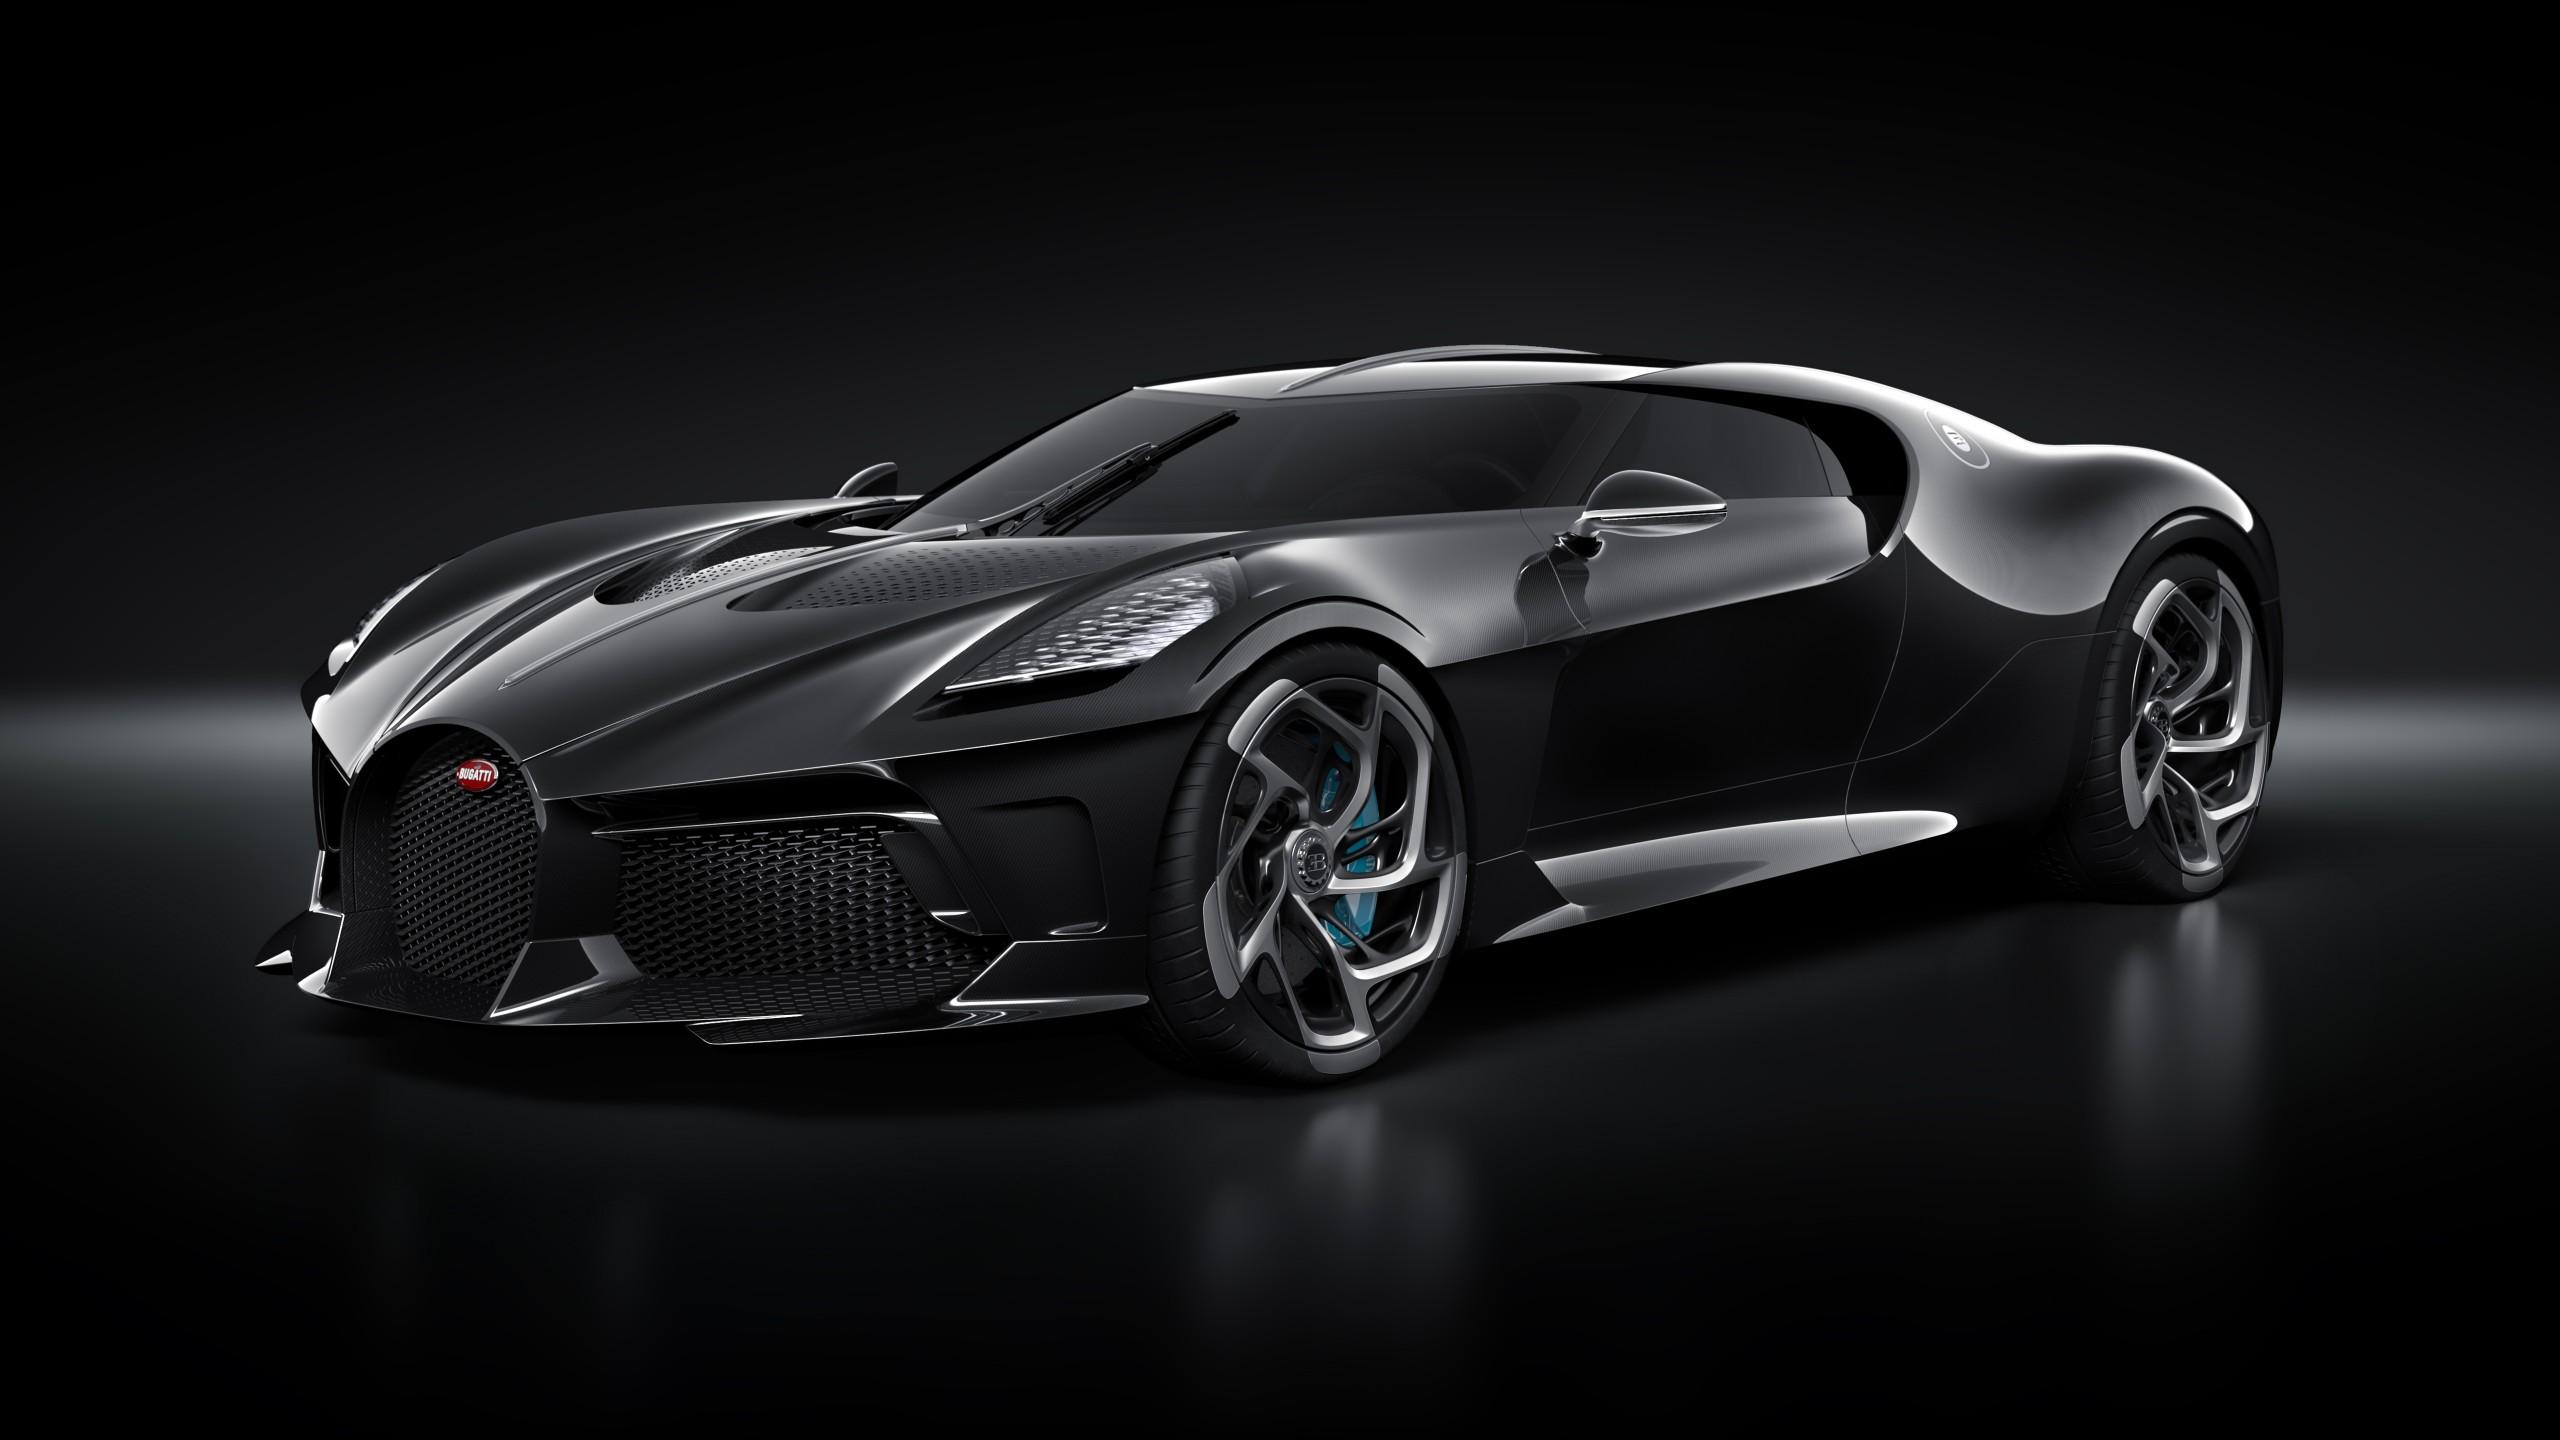 Bugatti Veyron Hd Wallpapers 2013 Bugatti La Voiture Noire 2019 Geneva Motor Show 5k